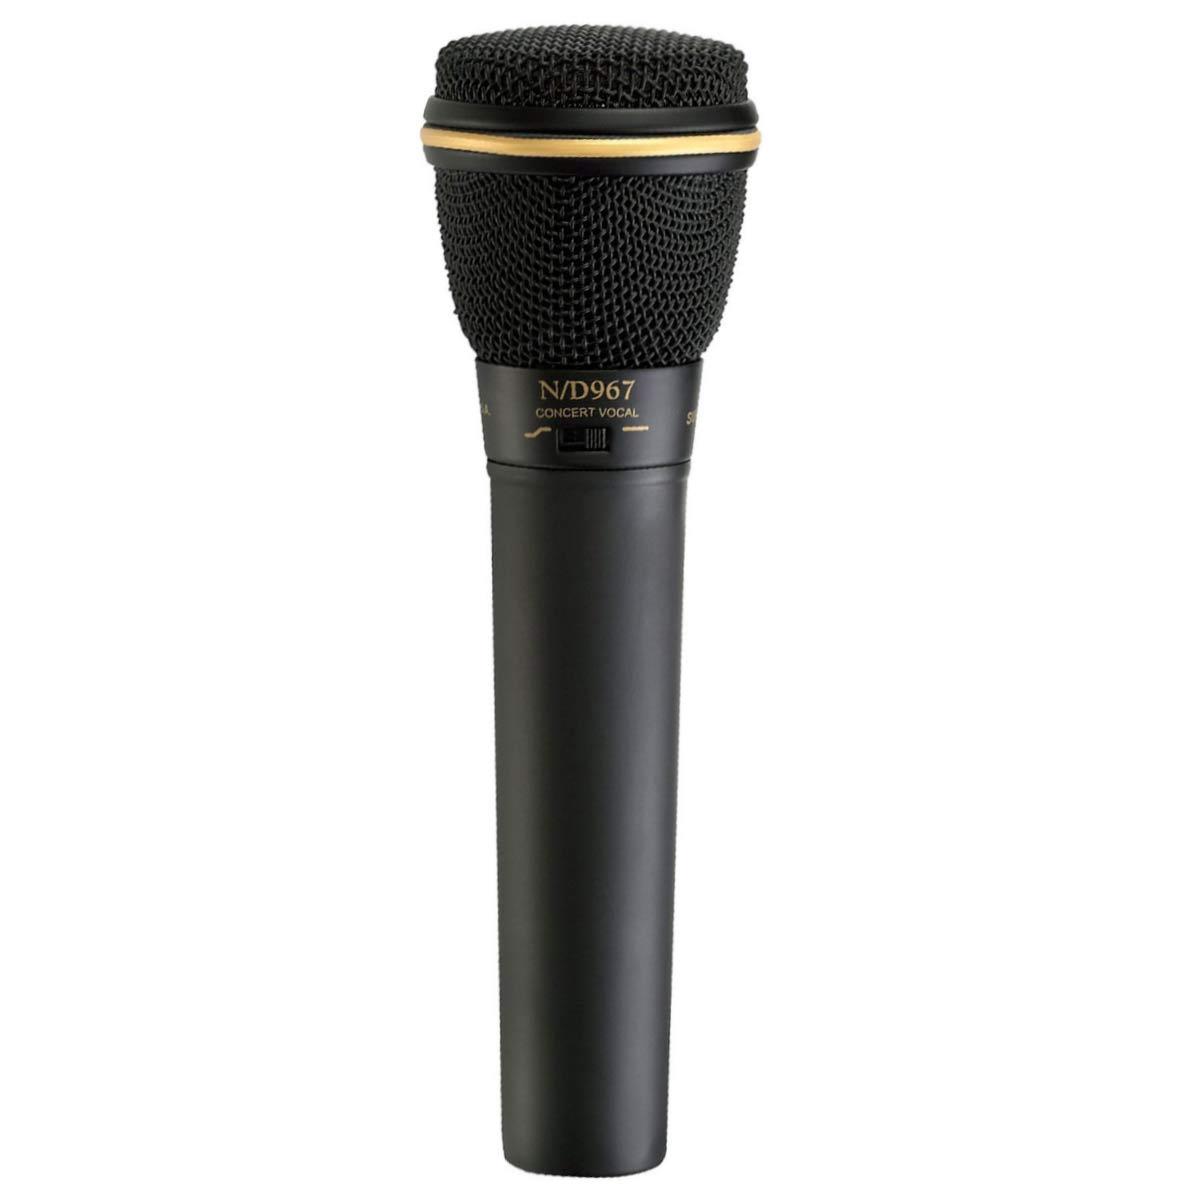 ND967 - Microfone c/ Fio de Mão ND 967 - Electro-Voice